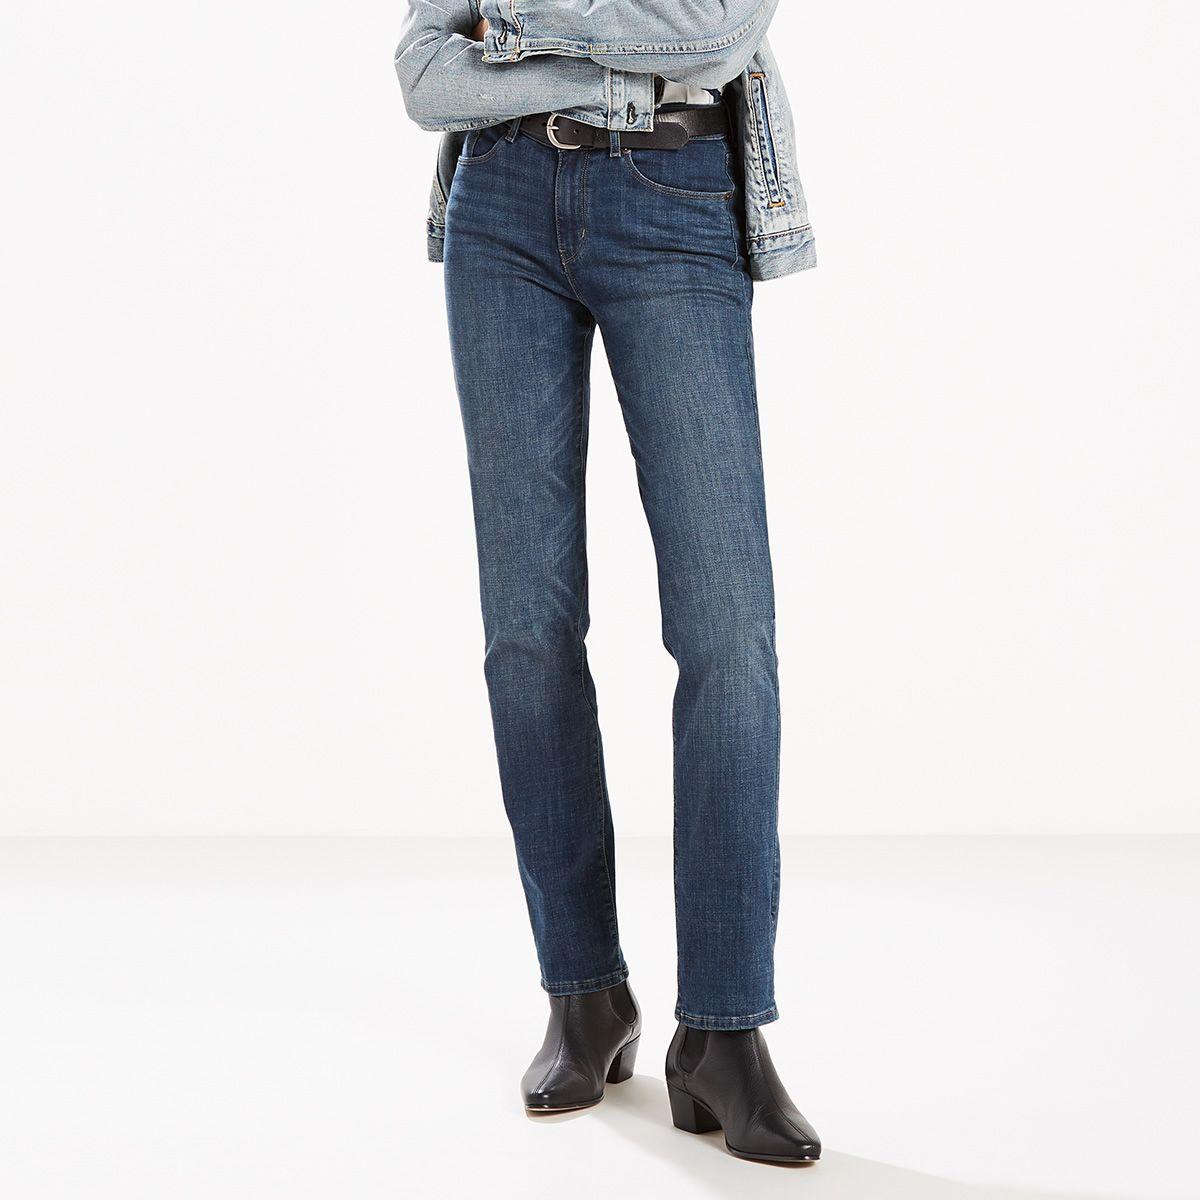 Womens Levis Jeans   Denim Apparel - Macy s 7a7ad3b1e5d